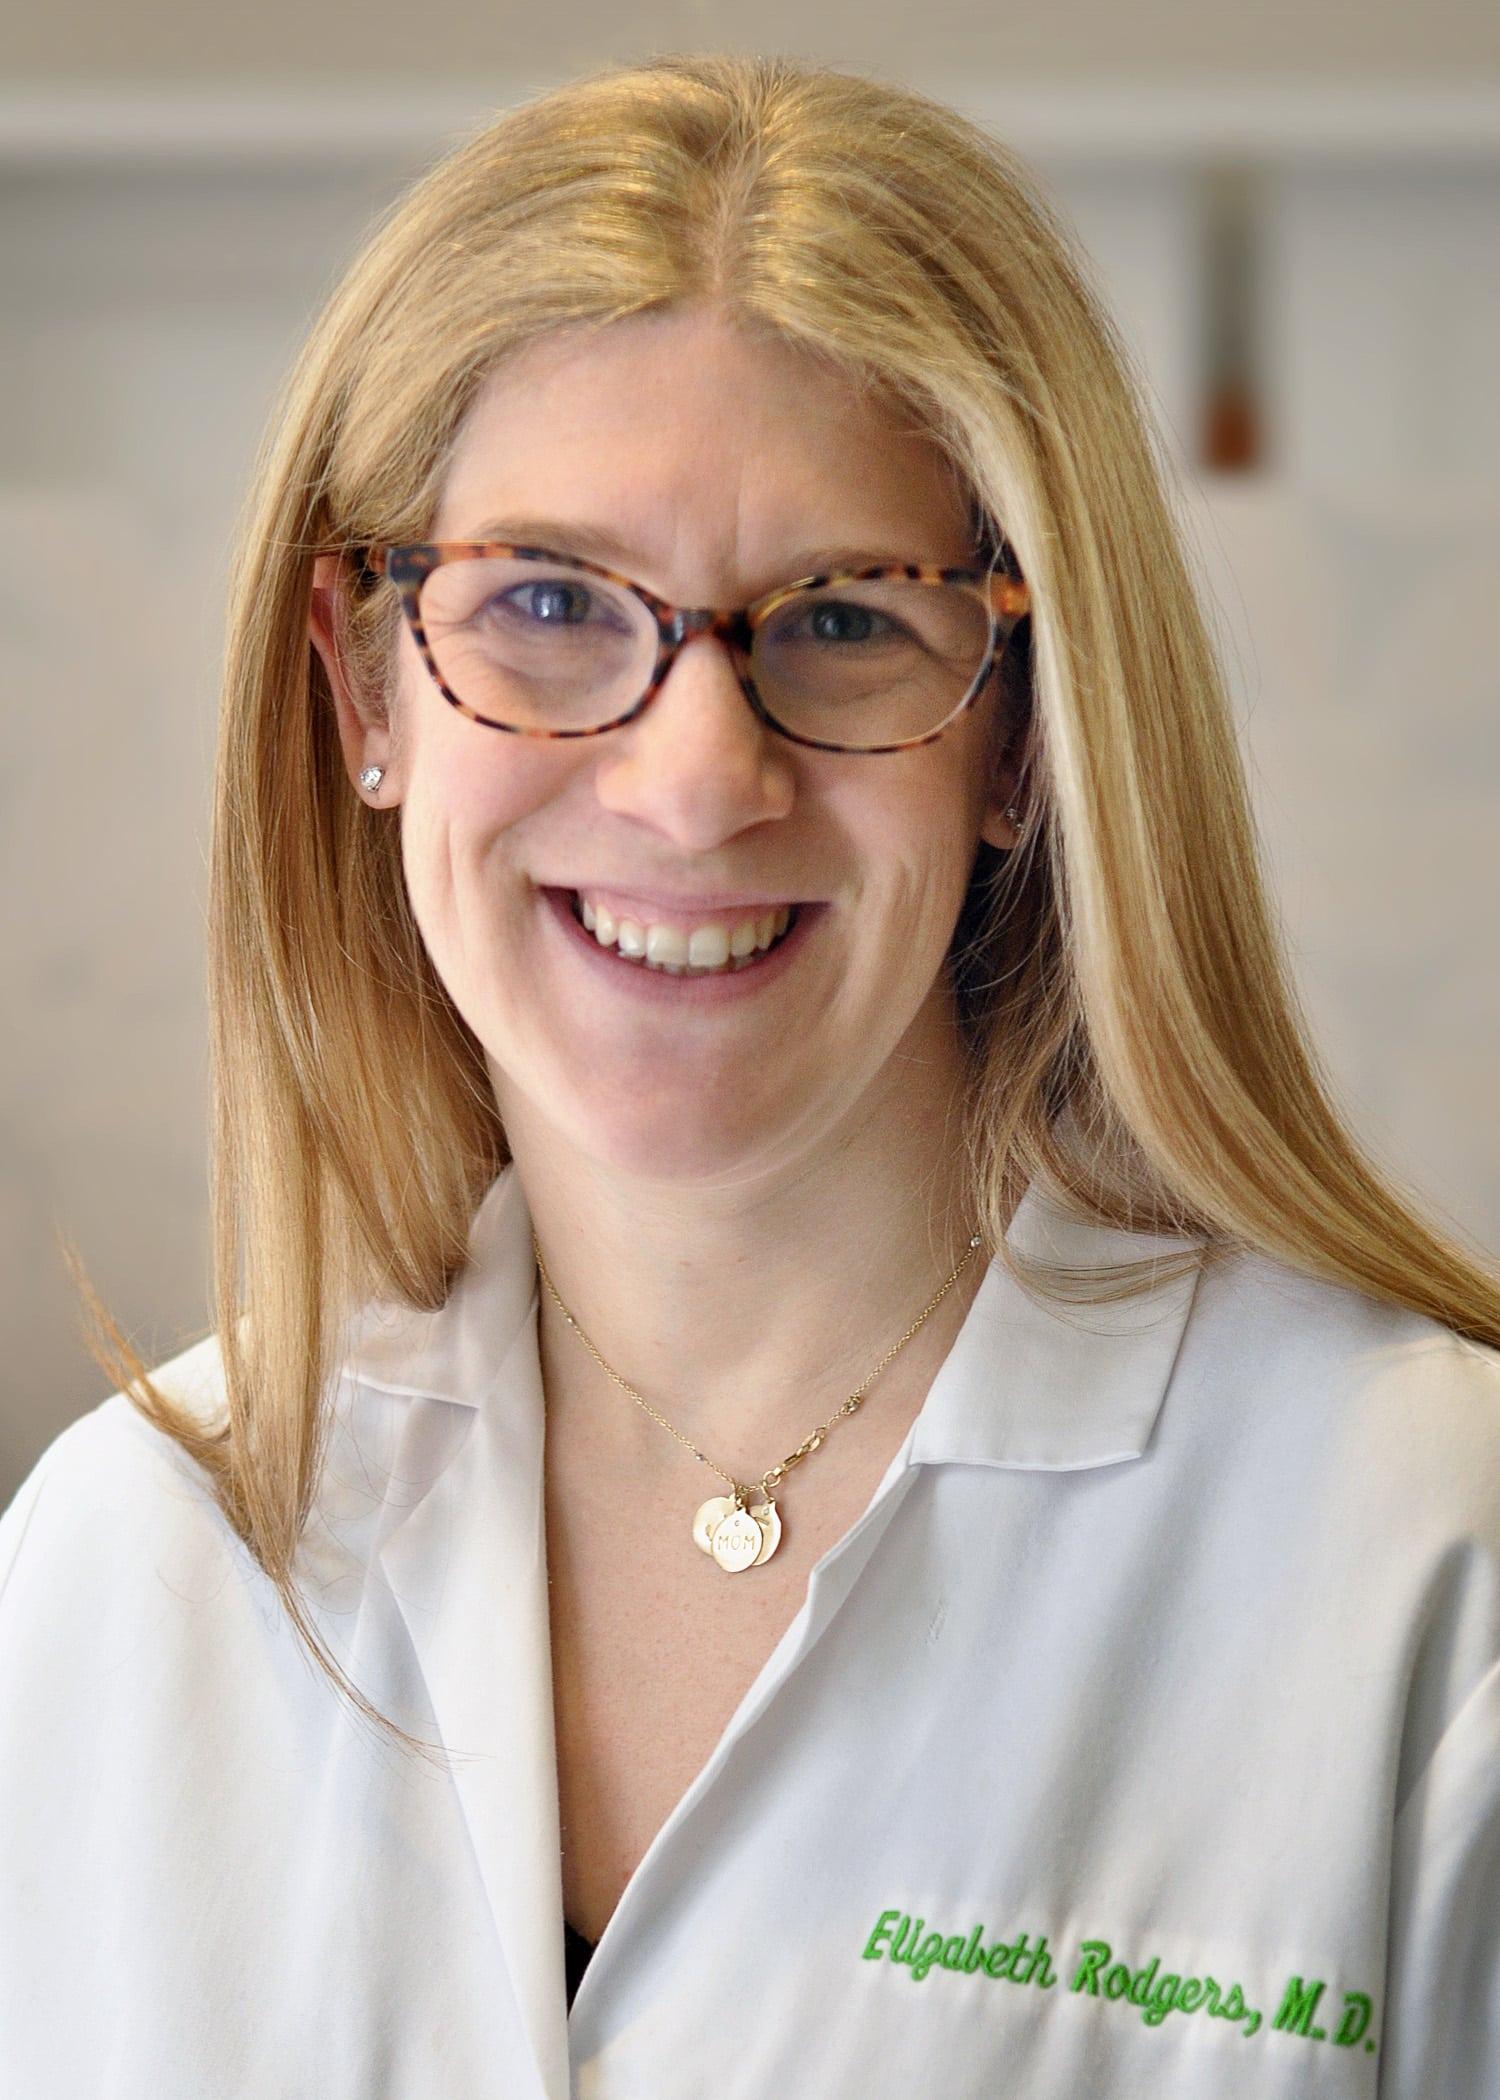 Elizabeth B Rodgers, MD Obstetrics & Gynecology